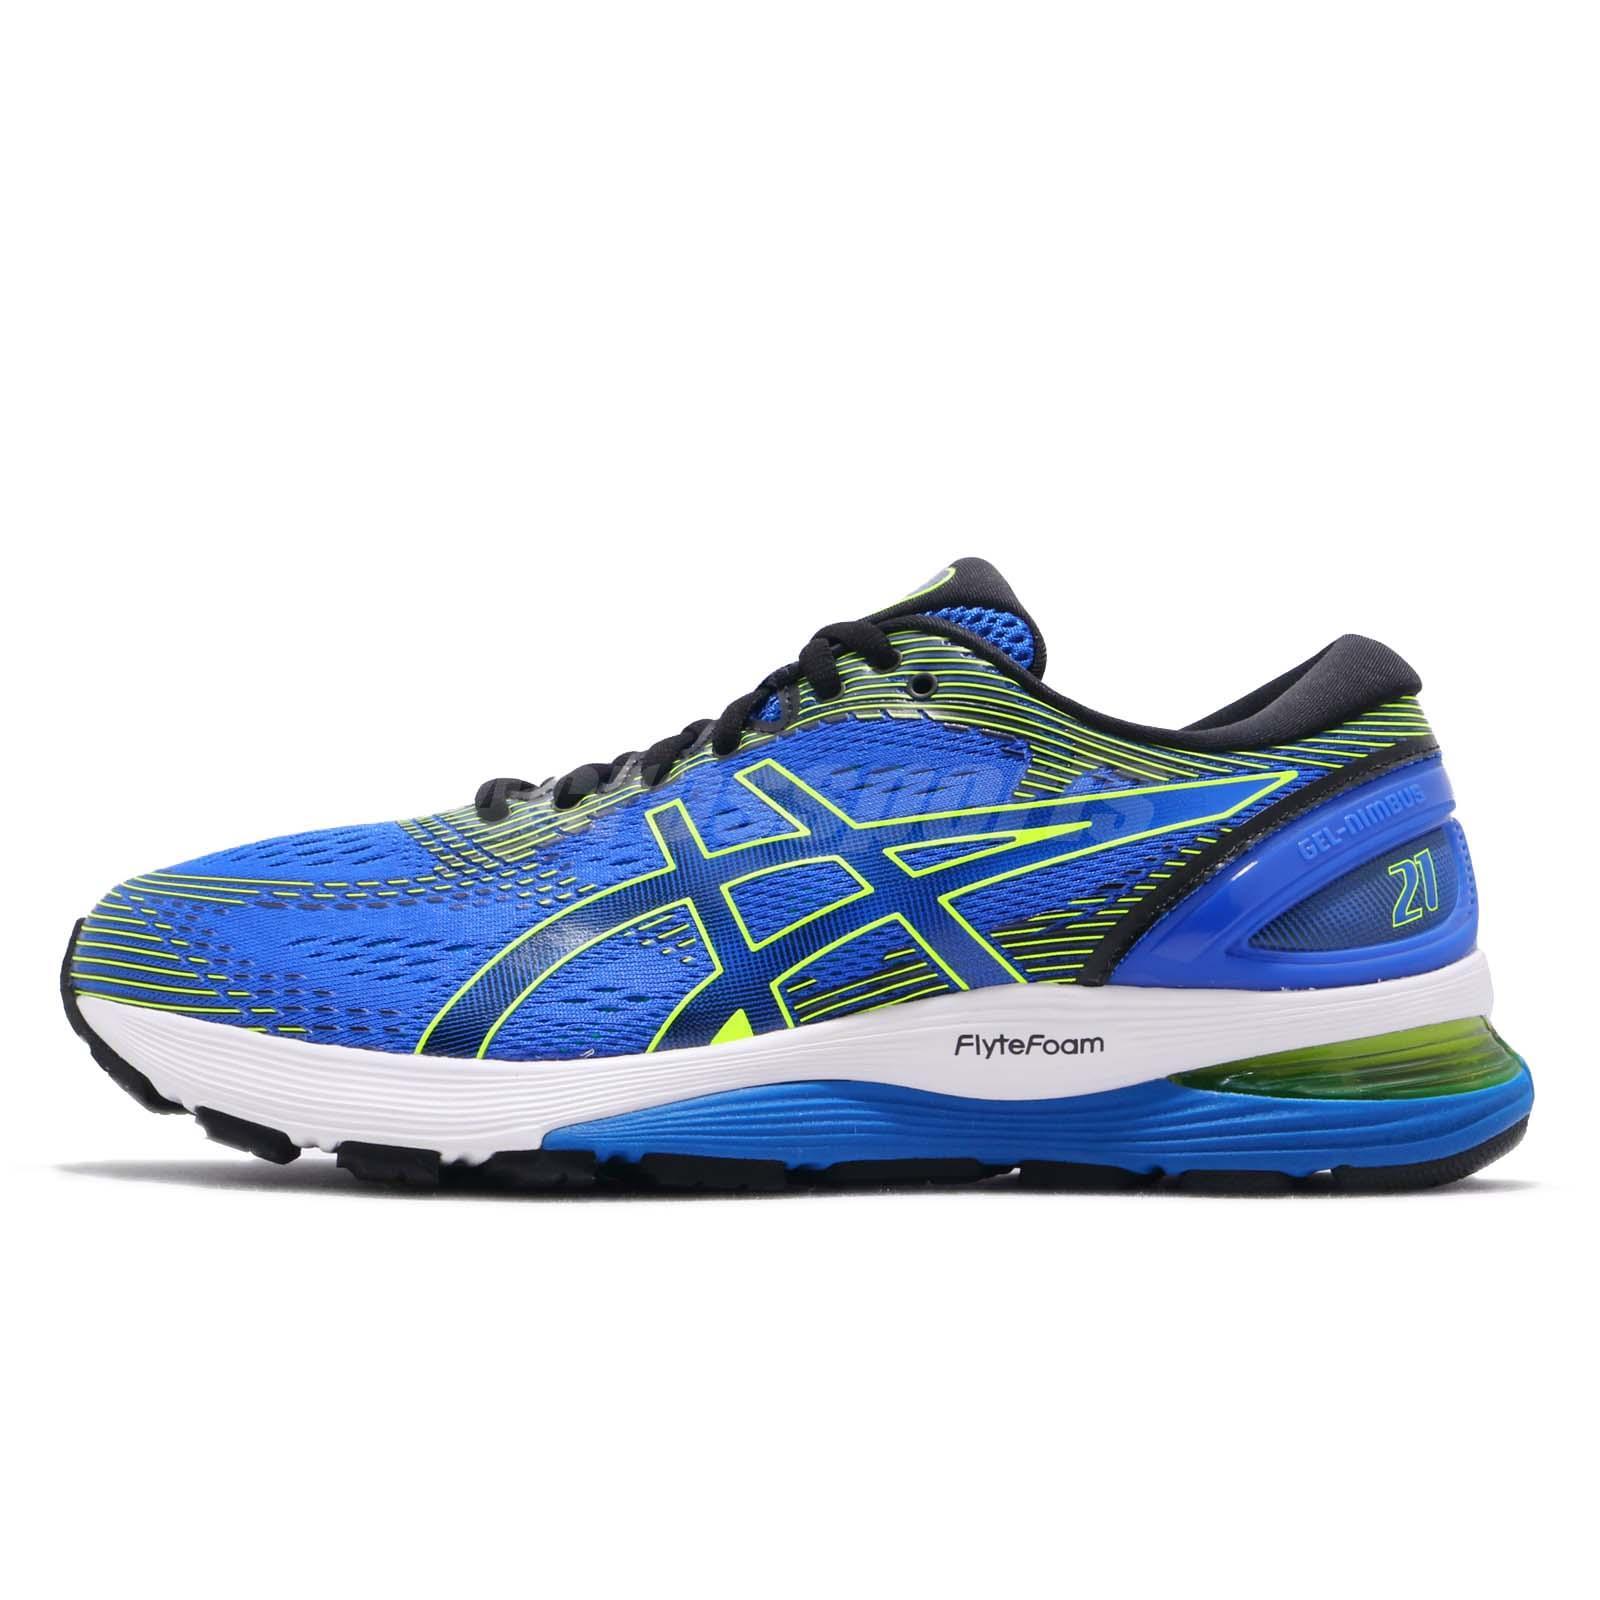 verdad siga adelante fuerte  Asics Gel Nimbus 21 4E Extra Wide Blue Black White Men Running Shoe  1011A168-400 | eBay